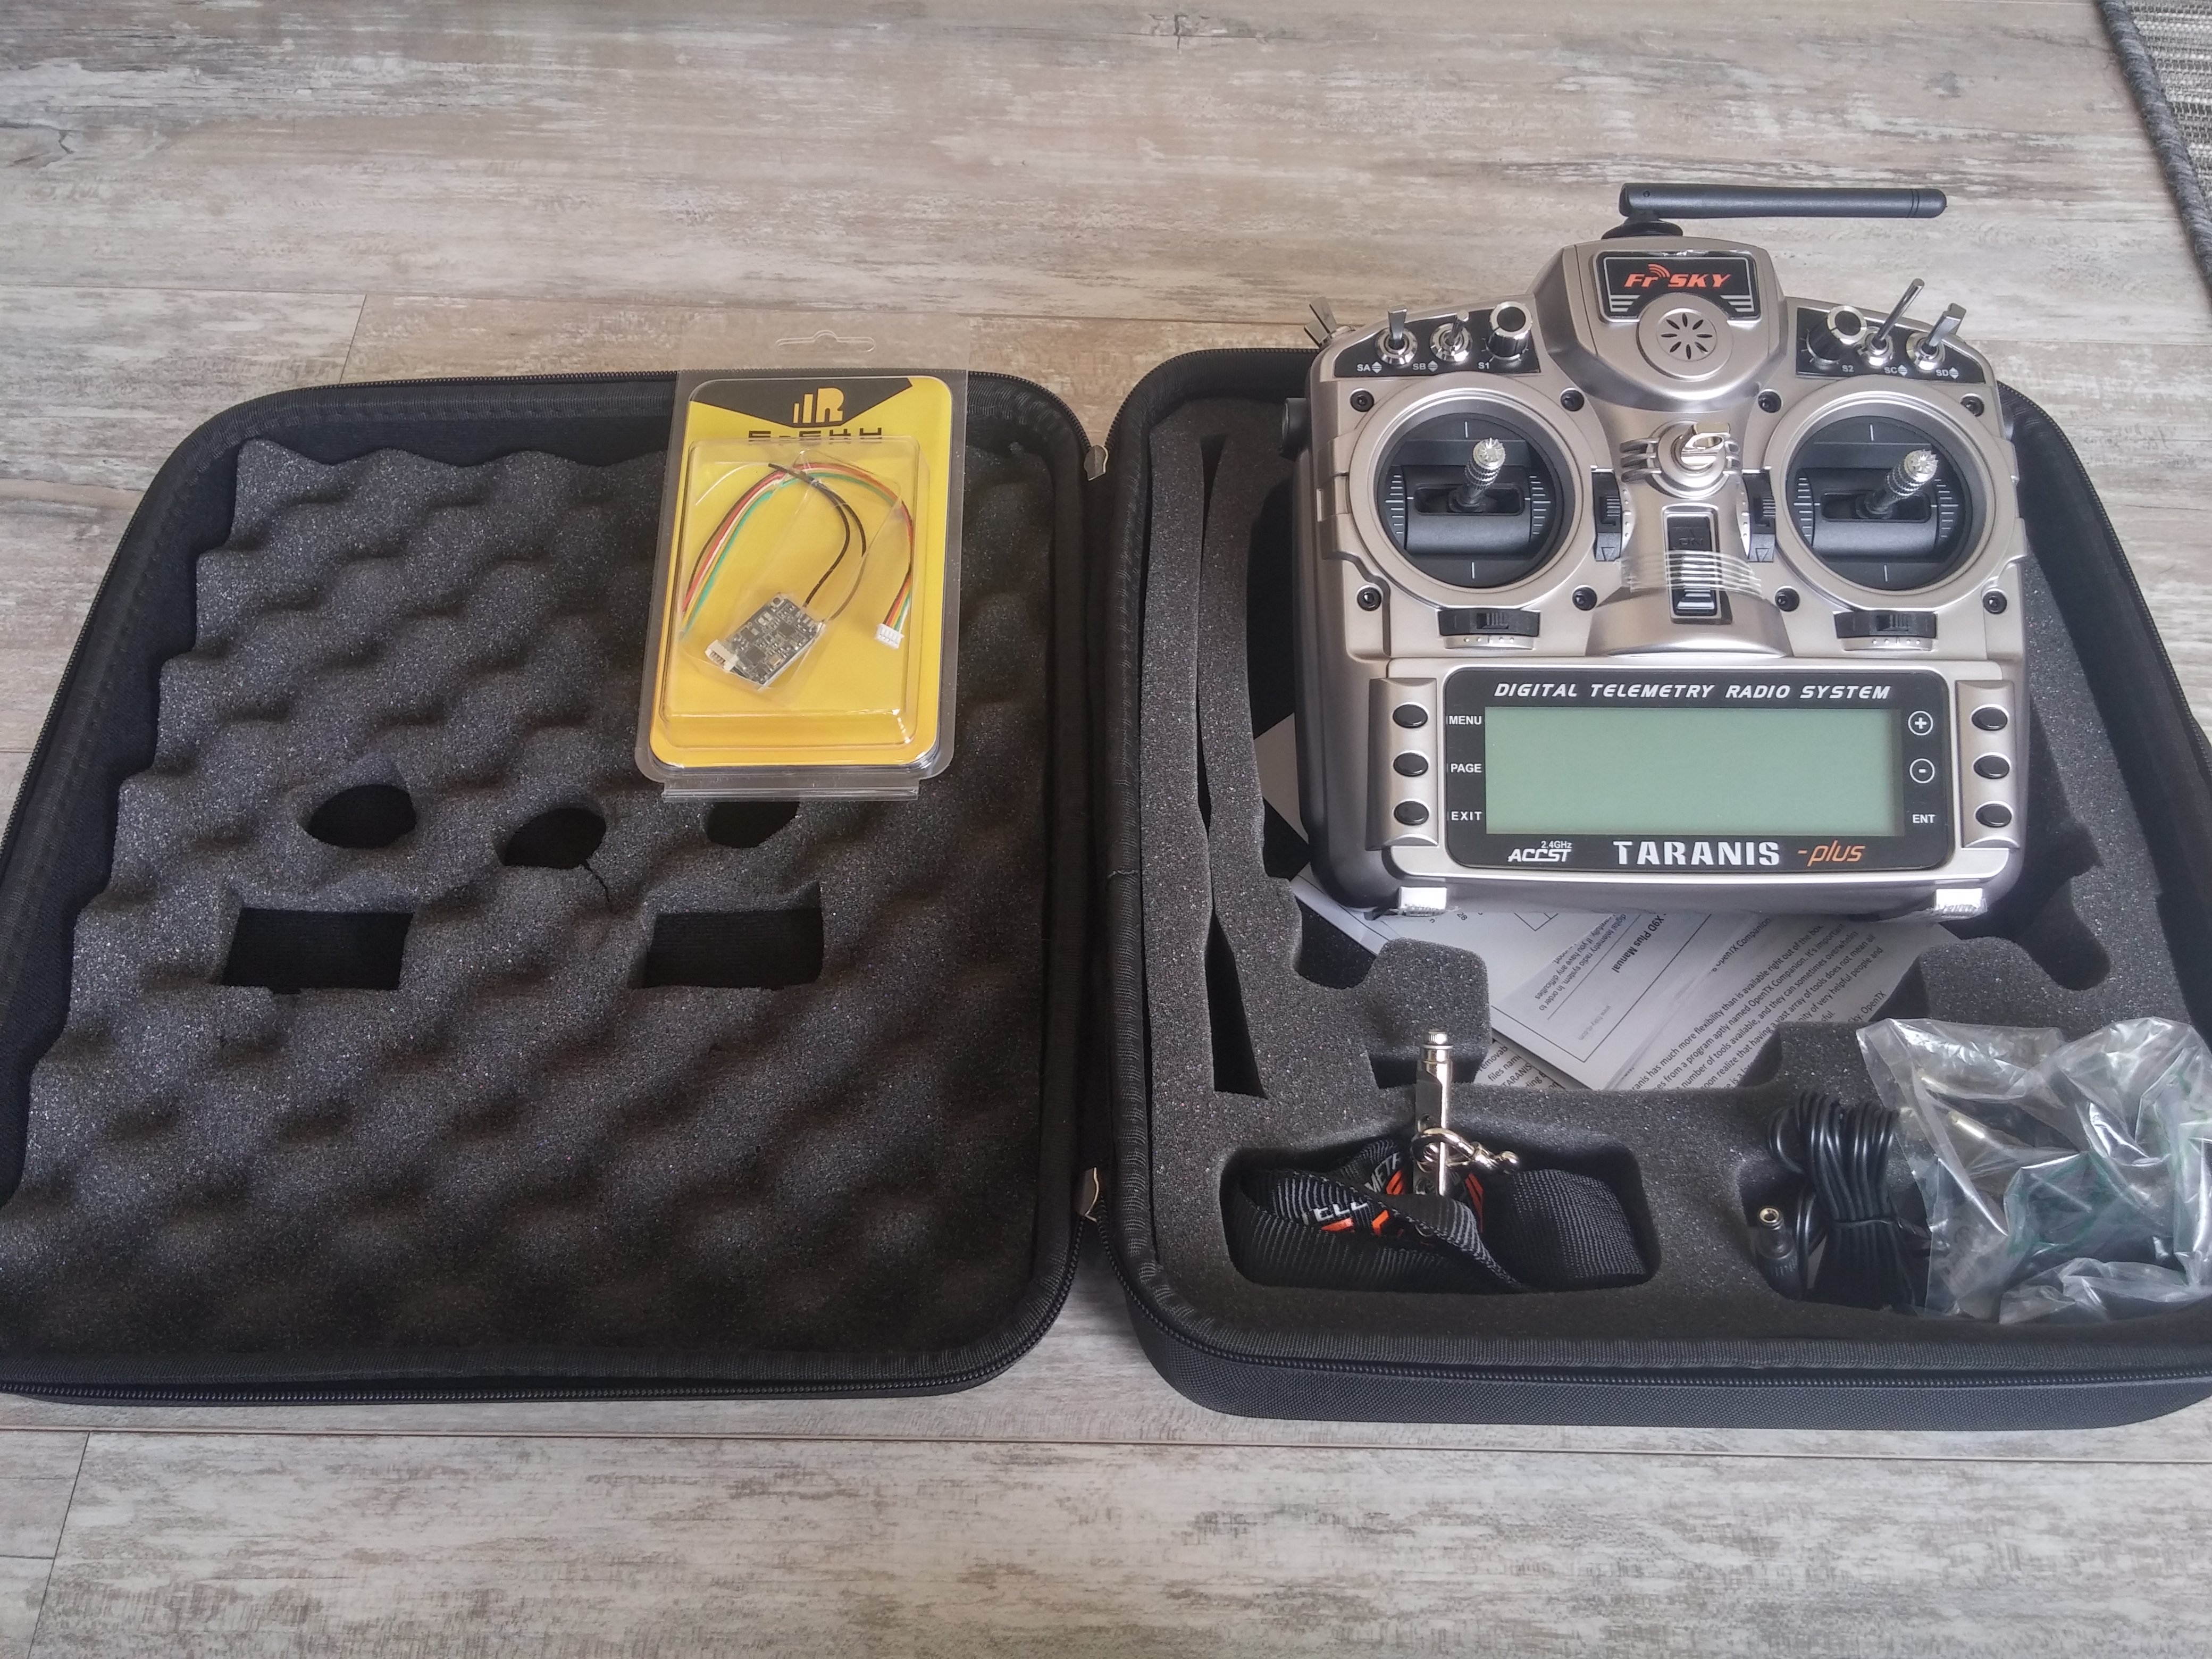 FrSky Taranis X9D Plus set (Taranis Plus & EVA bag